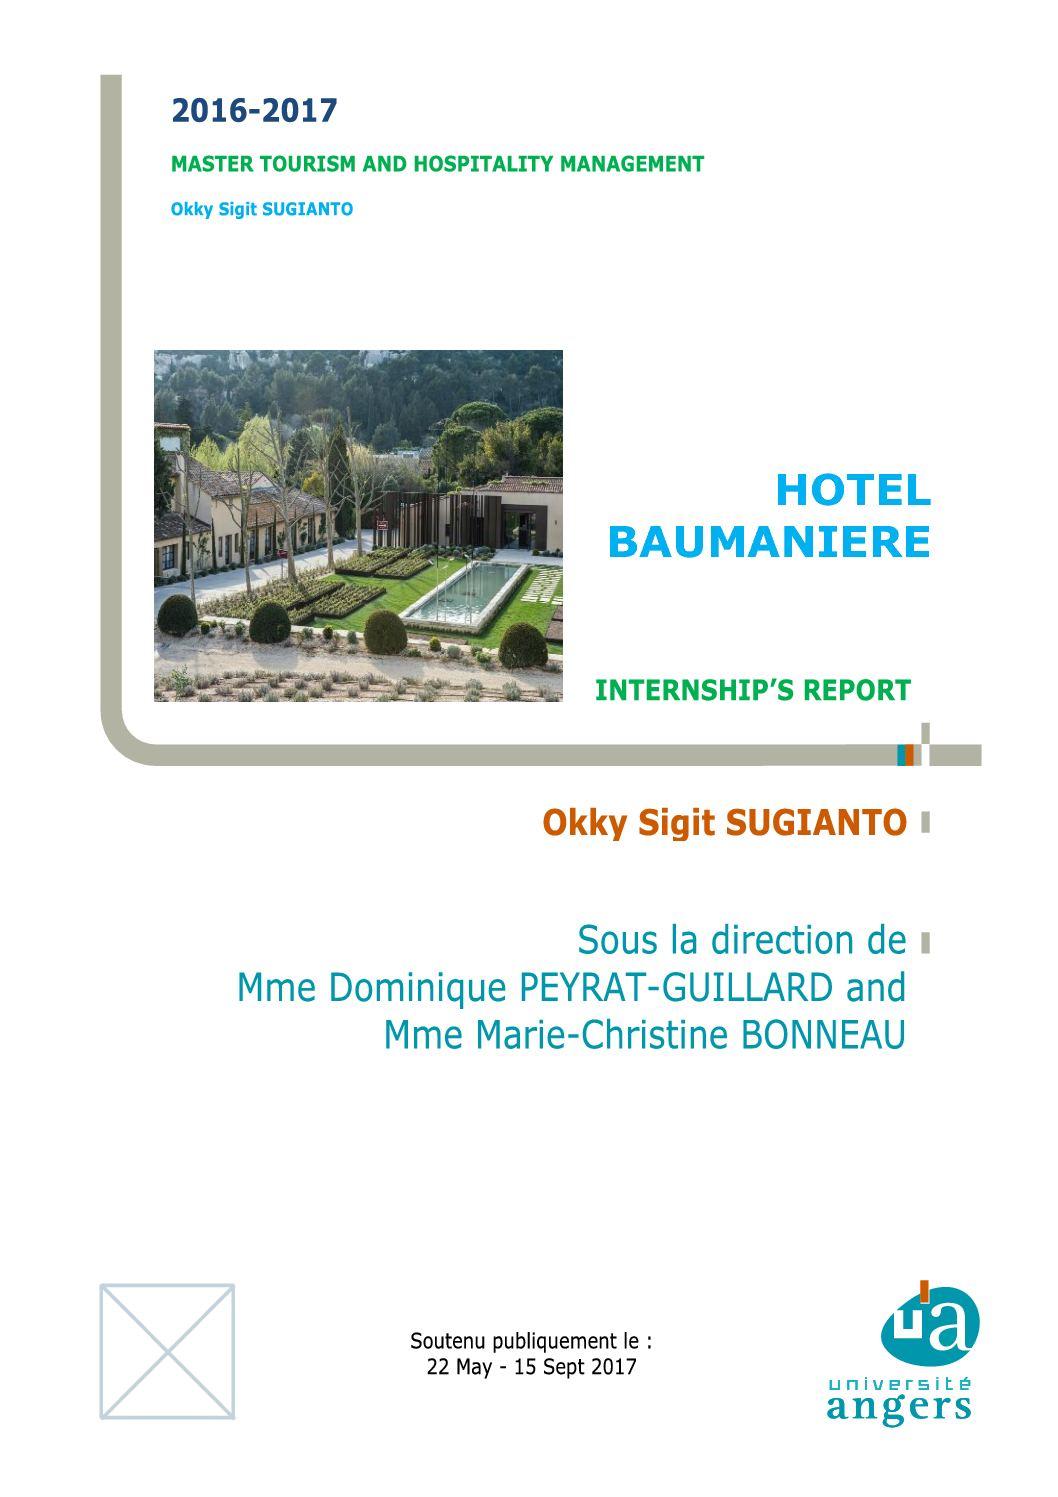 Le Jardin Du Thé Grenoble Beau Calaméo Internship S Report Of 73 Frais Le Jardin Du Thé Grenoble